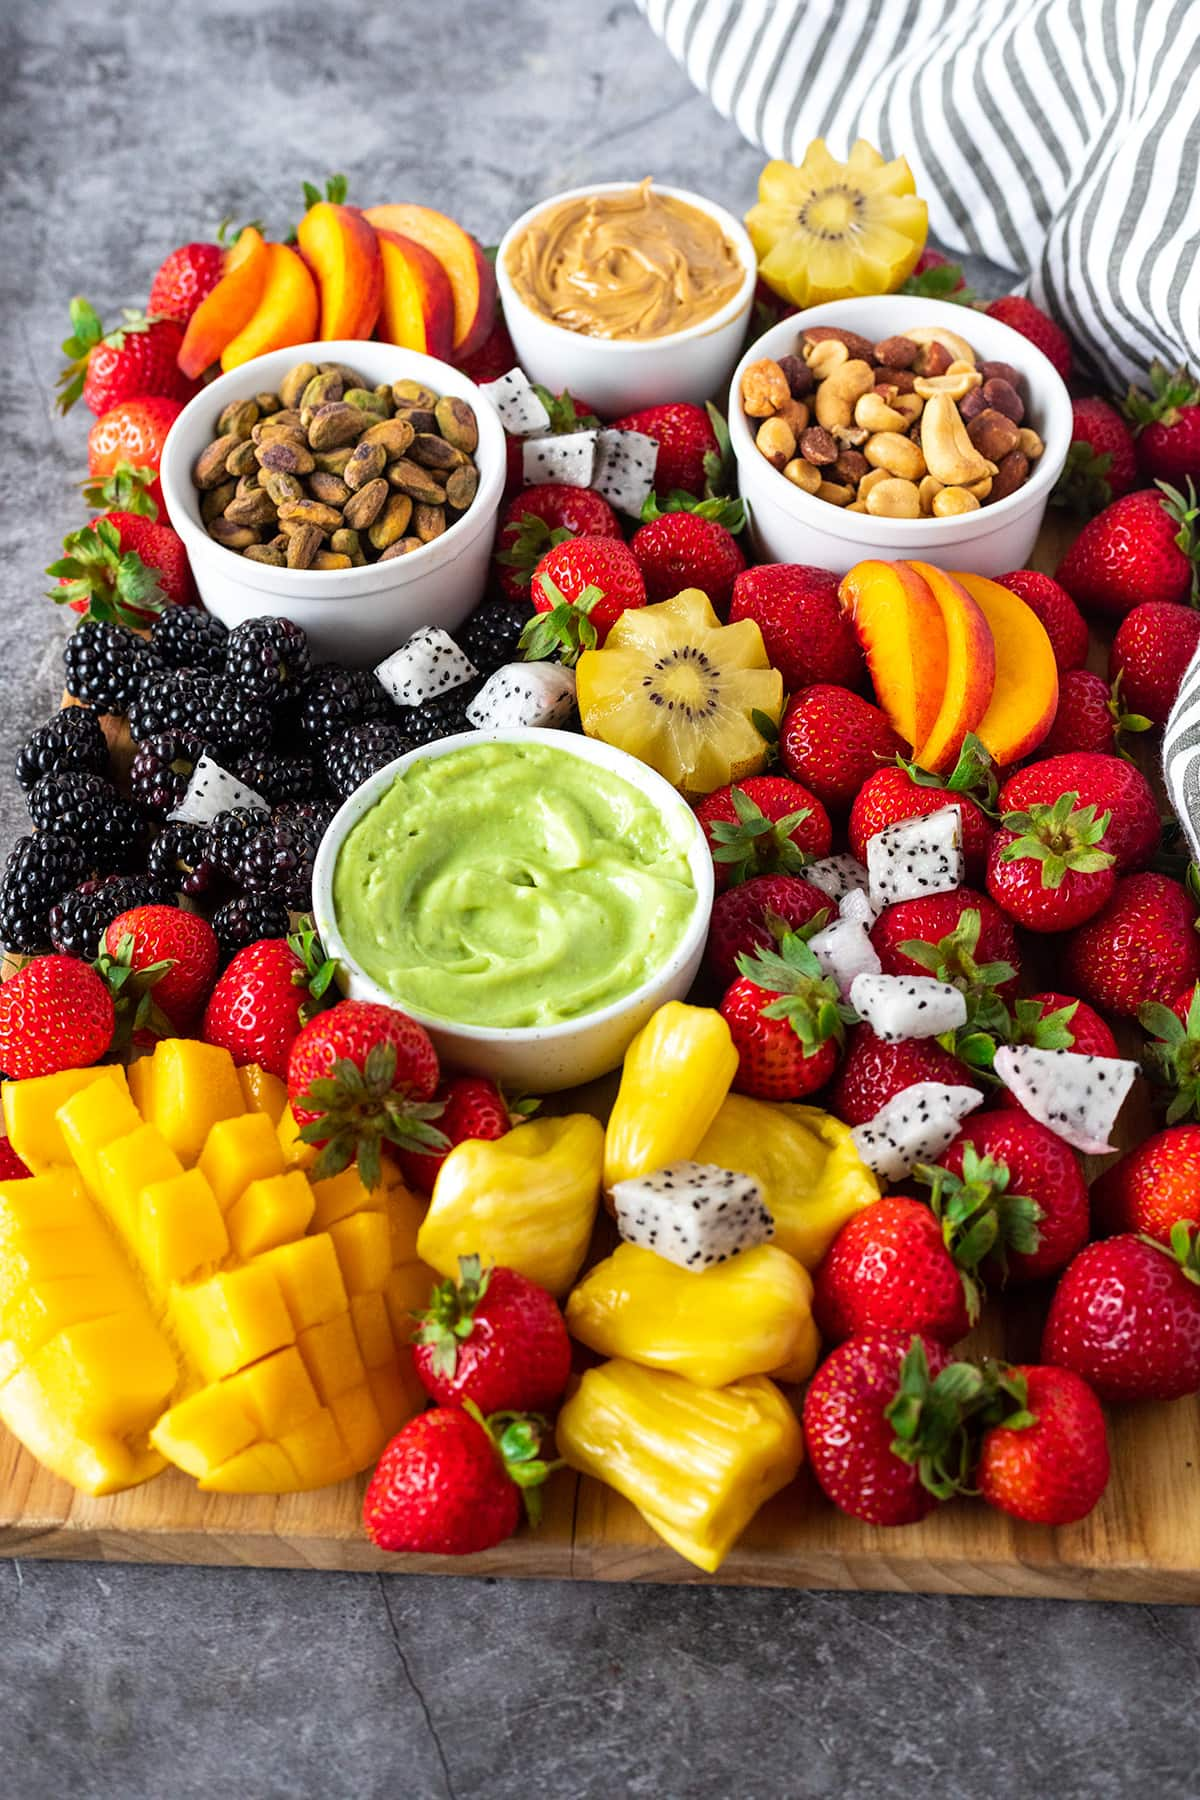 vegan key like dip on a cutting board with fruits like mango, peach, strawberries, nuts